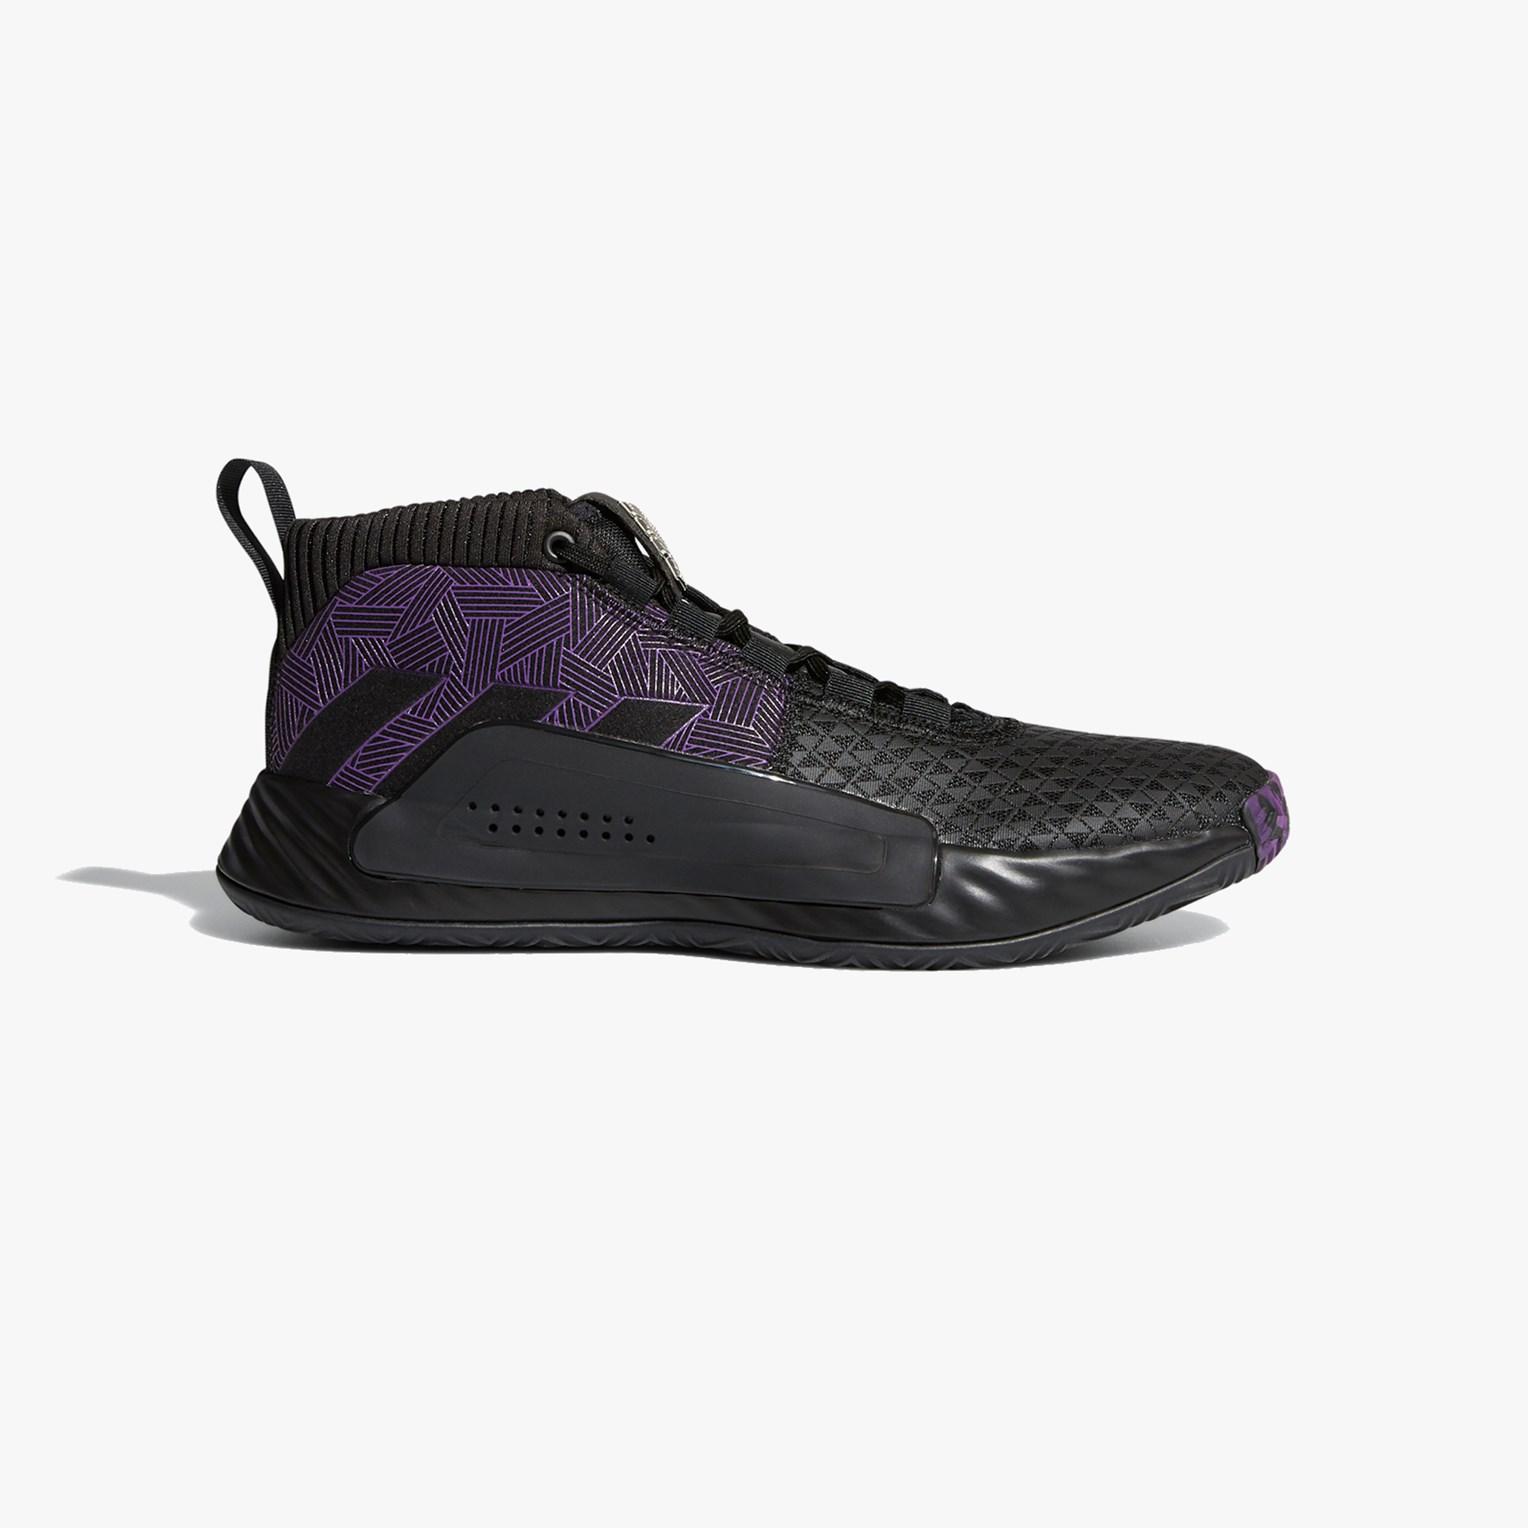 MARVEL x adidas ''Heroes Among Us'' Sneaker Style